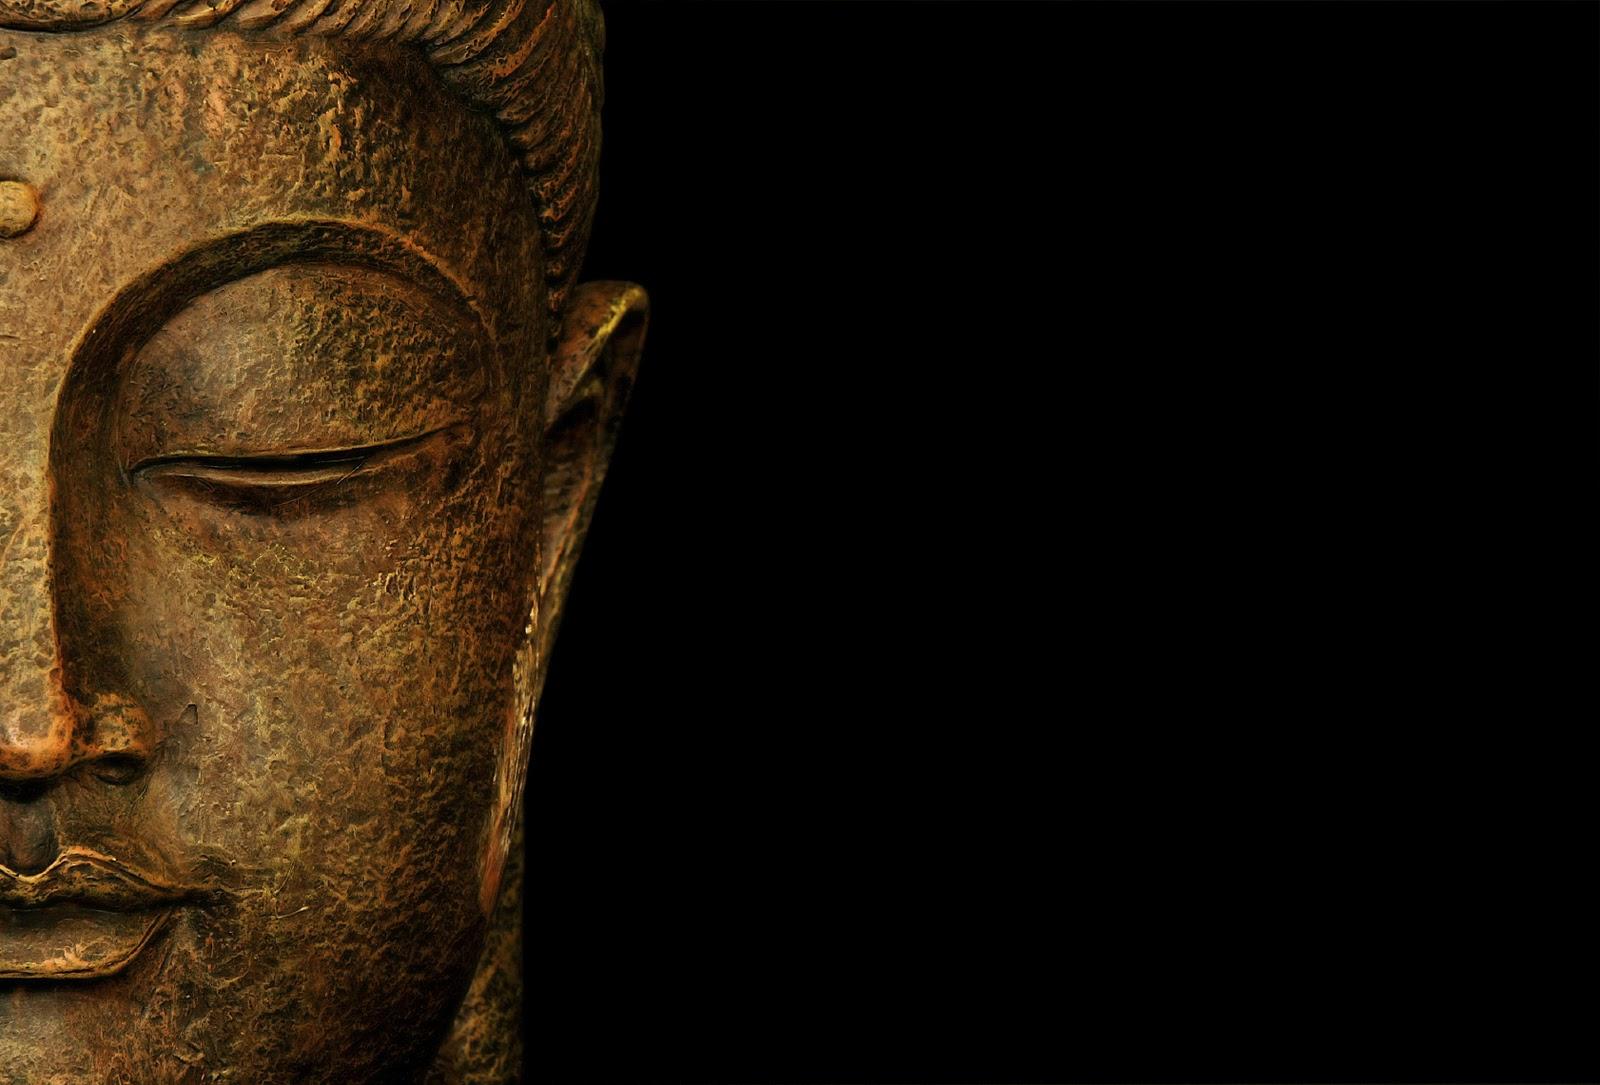 http://4.bp.blogspot.com/-YfMlp9ZG-0E/TVemFeaqyGI/AAAAAAAAAEo/jTvK53bd7wM/s1600/buddha.jpg